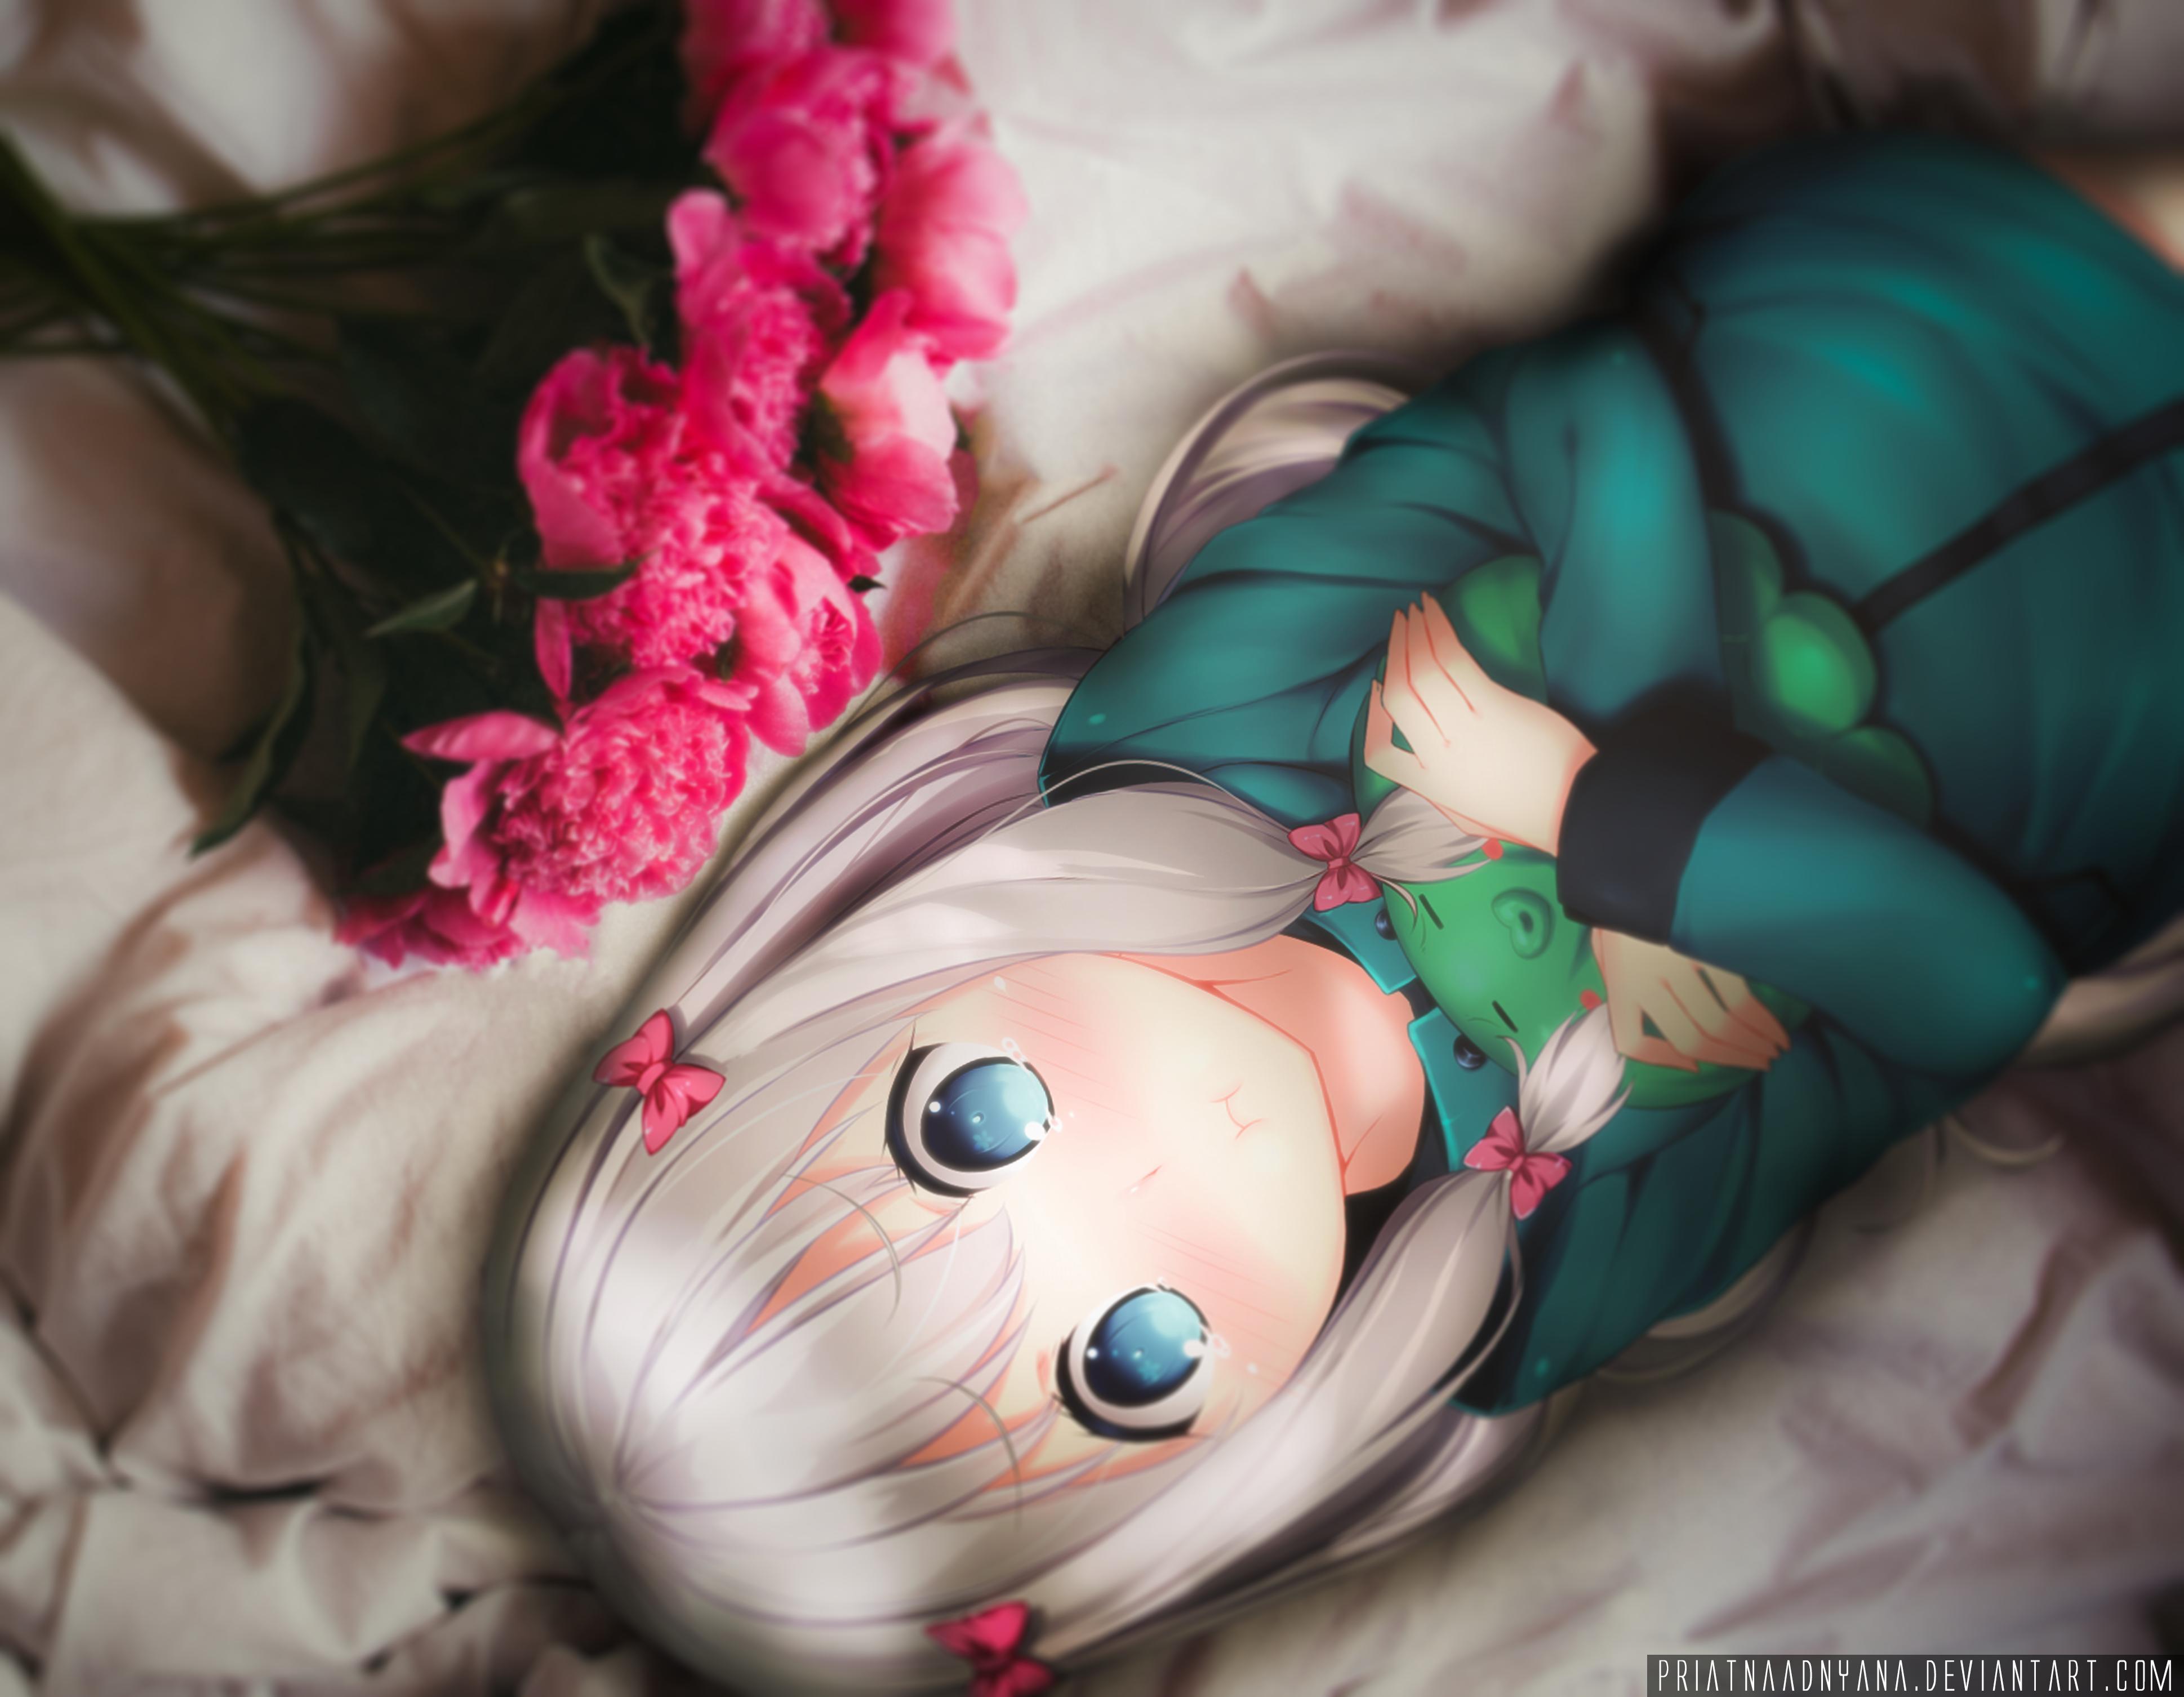 Blue Eyes Eromanga Sensei Girl Sagiri Izumi White Hair 3877x3012